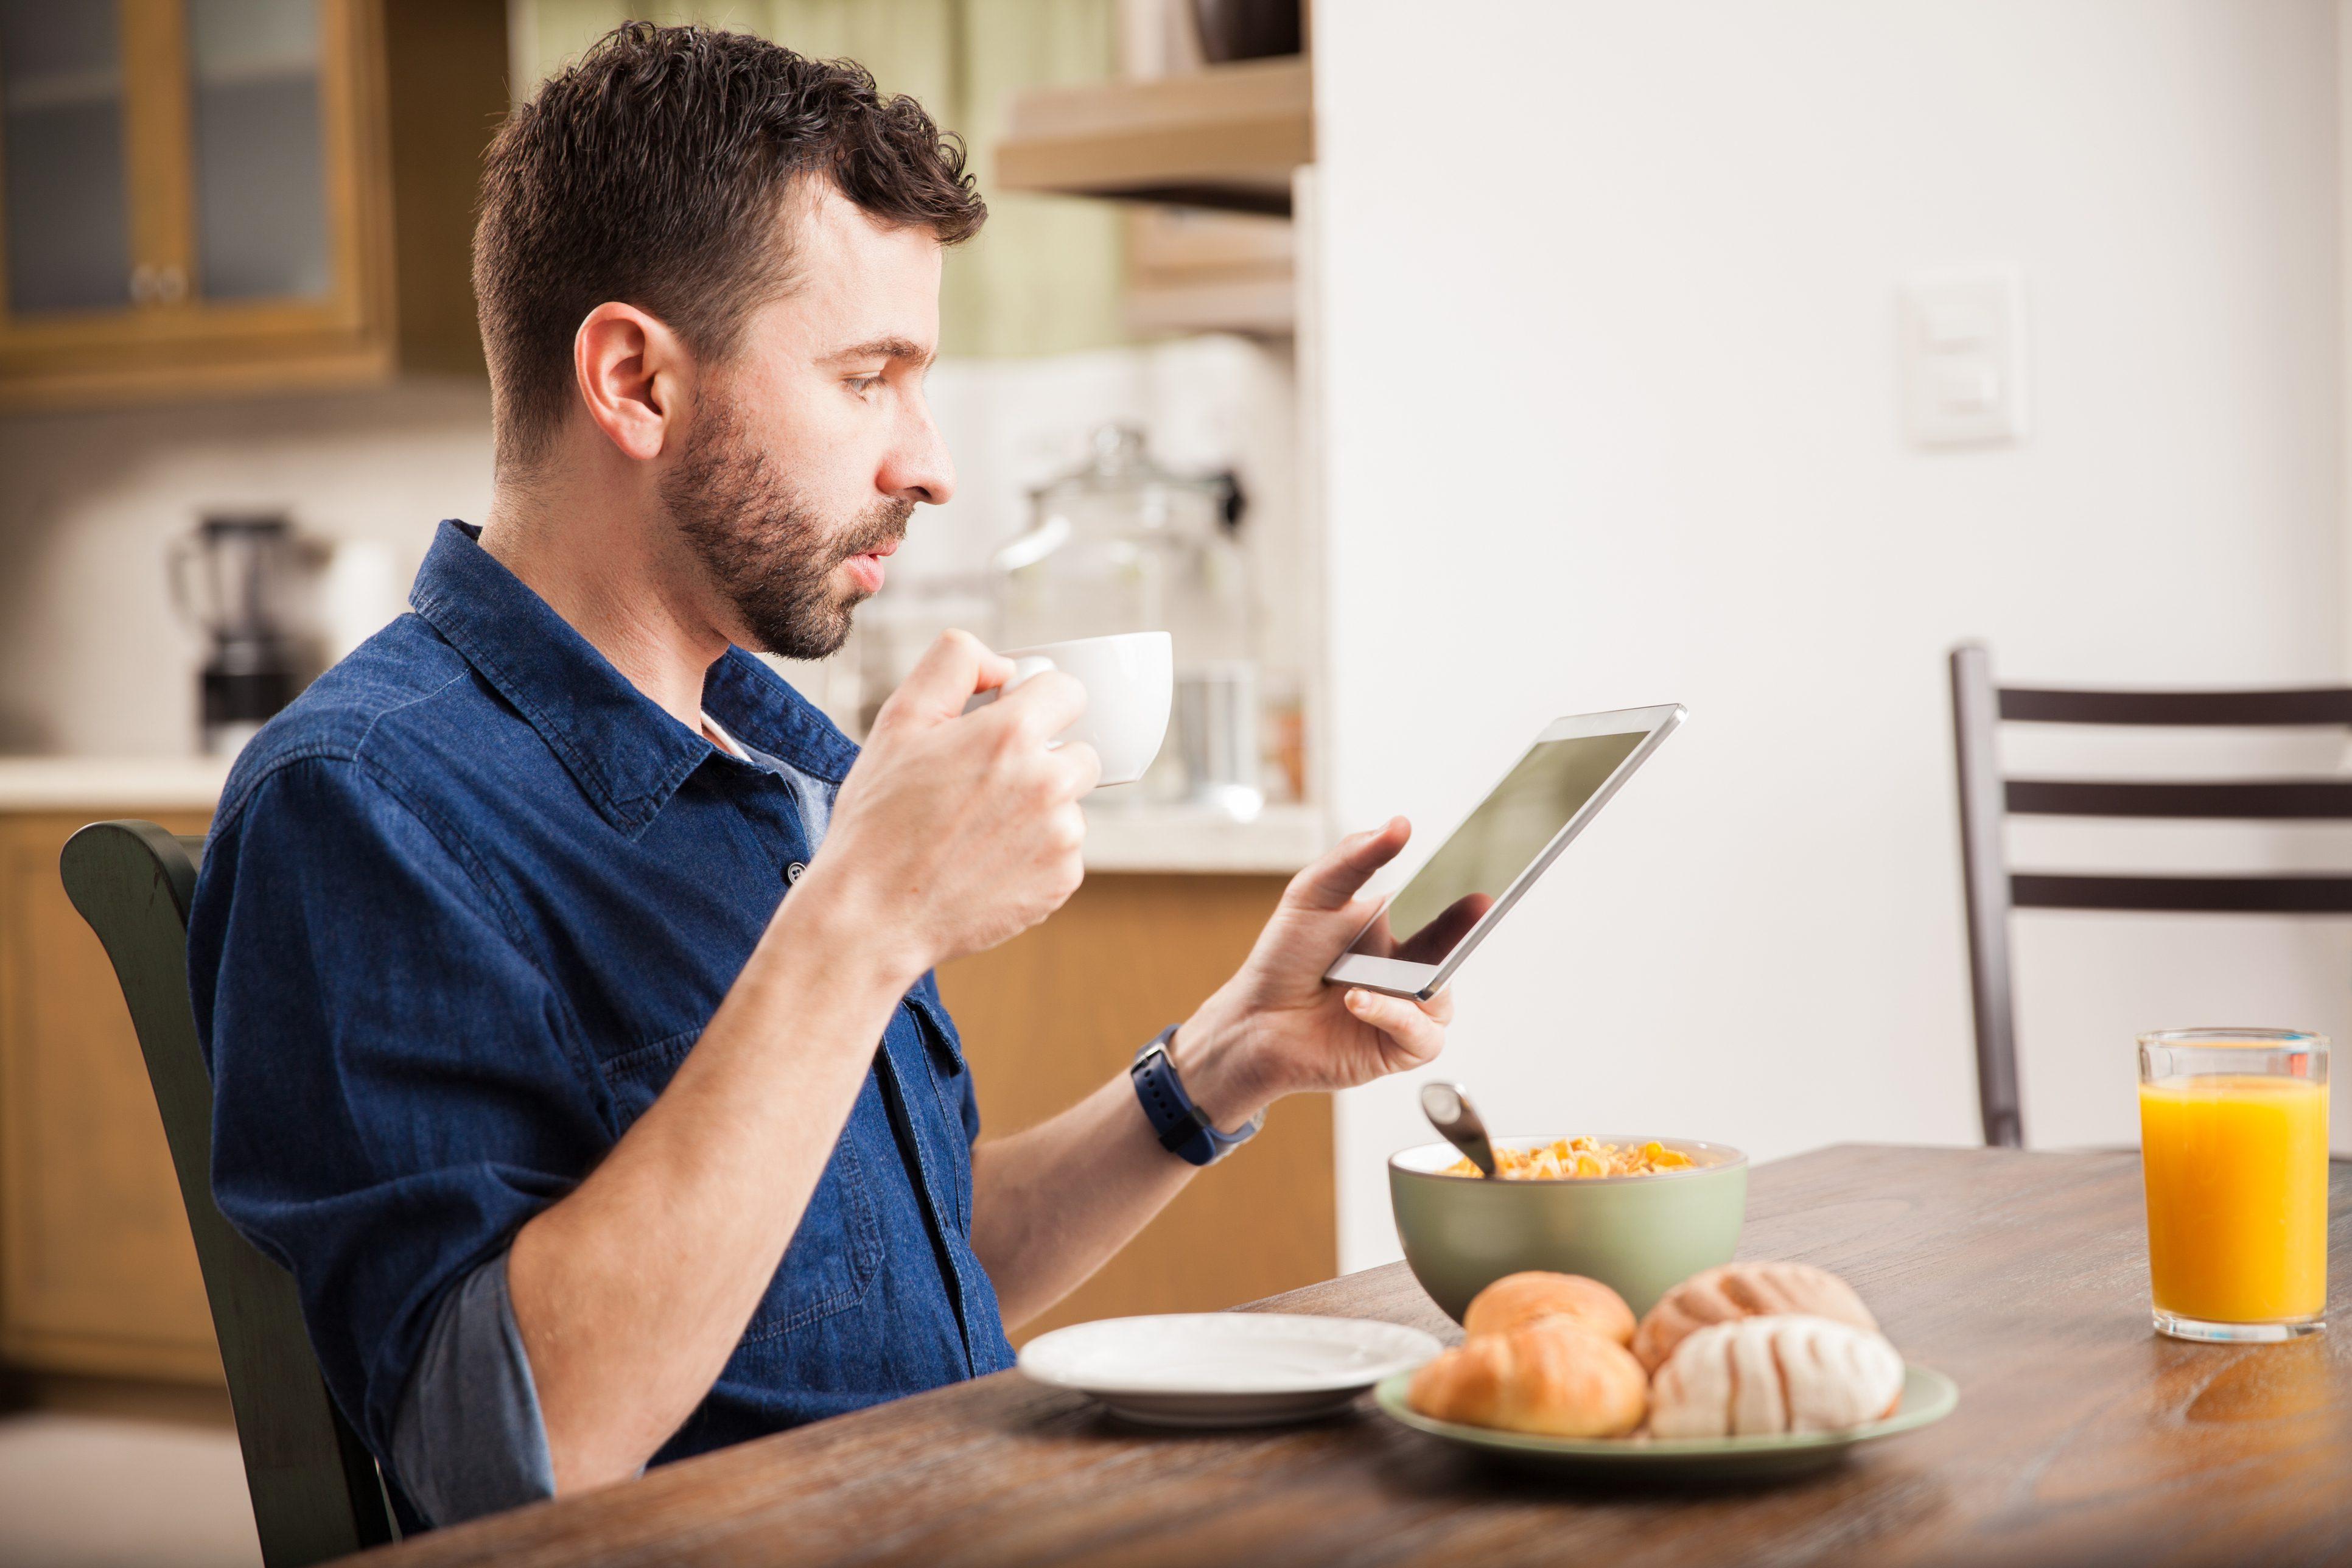 Ex Boyfriend Keeps Looking At My Online Dating Profile?